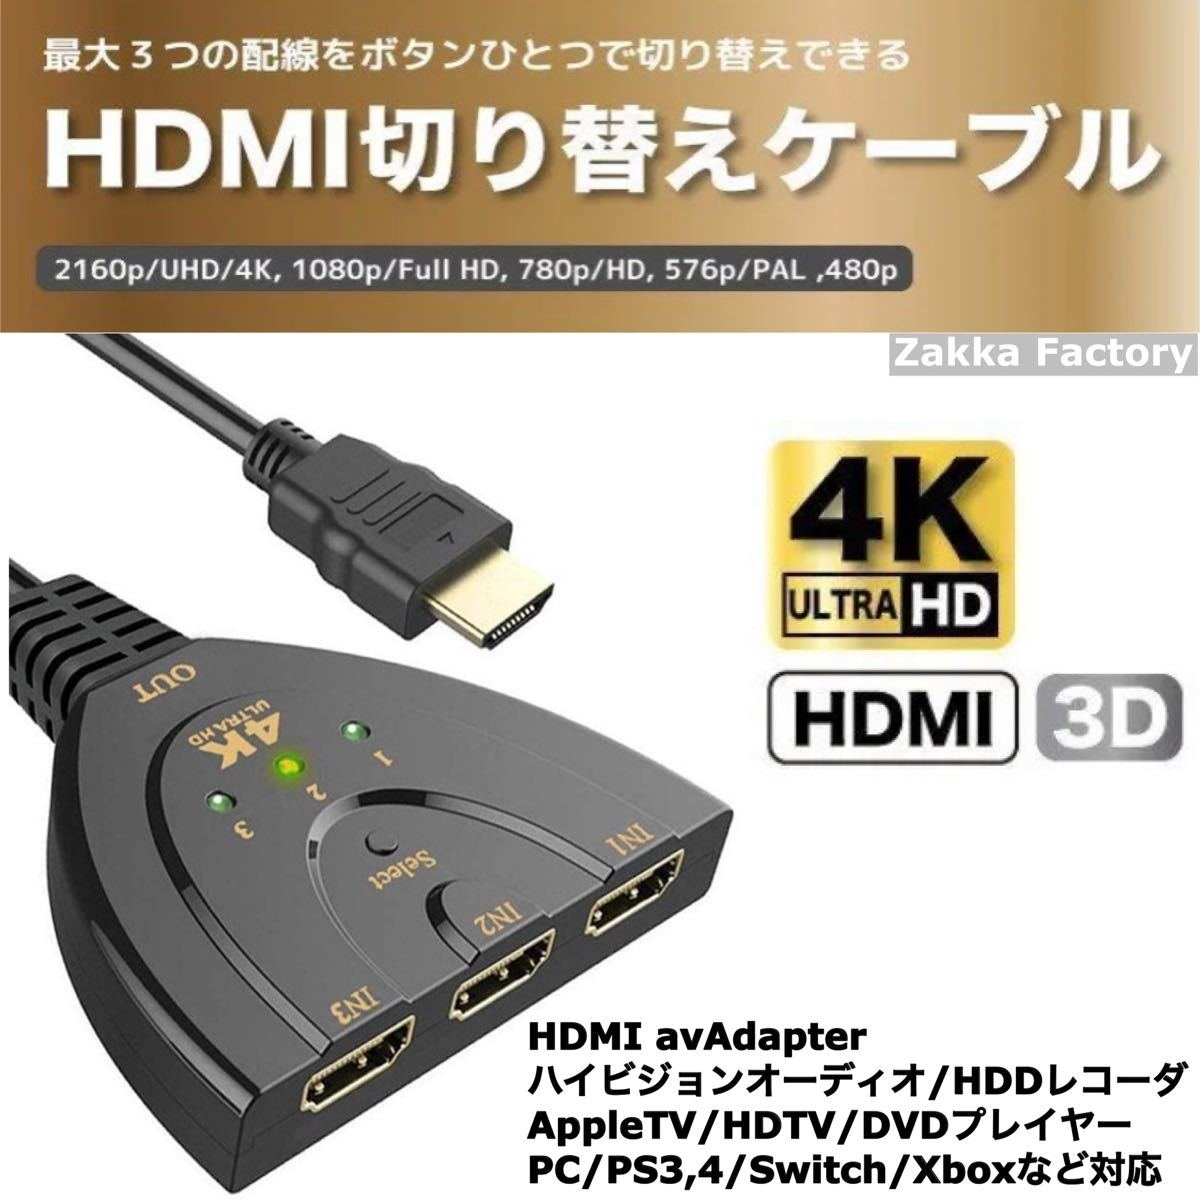 4K  HDMI セレクタ 切替器 分配器 3入力1出力 ゲーム ケーブル HDMI切替器 HDMI変換